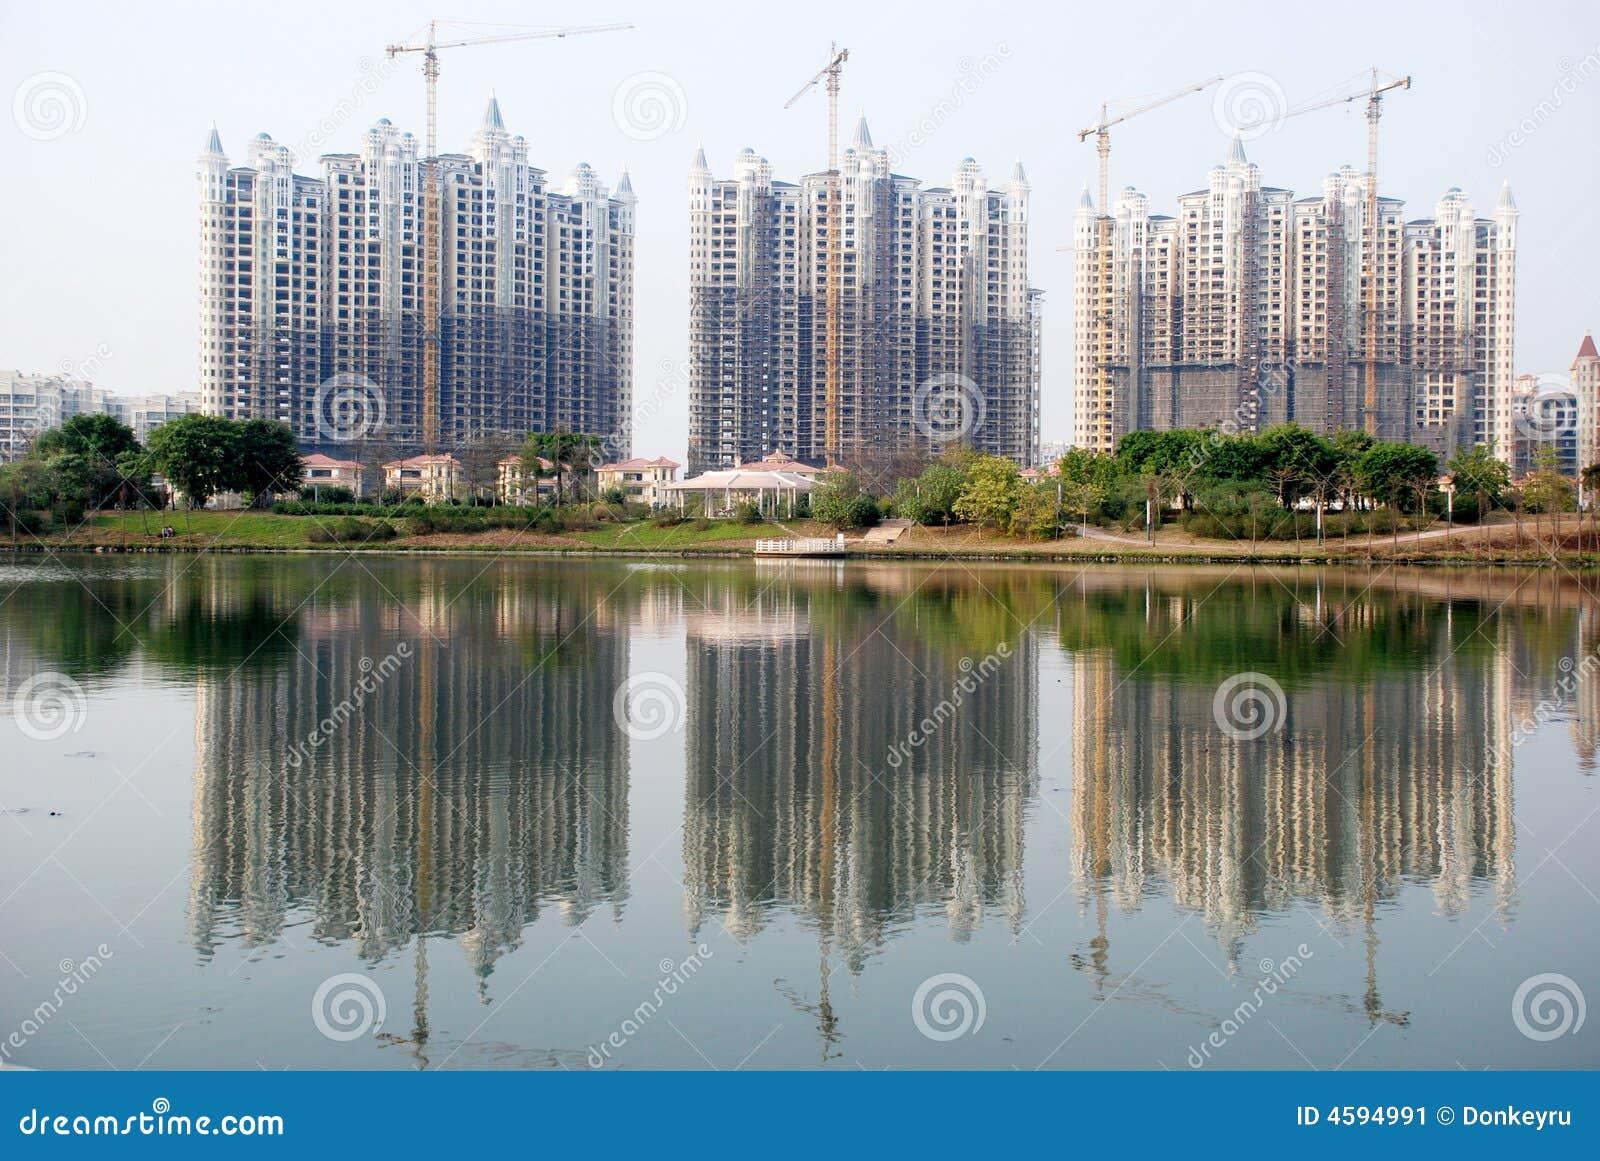 Budynek budowy lakeside